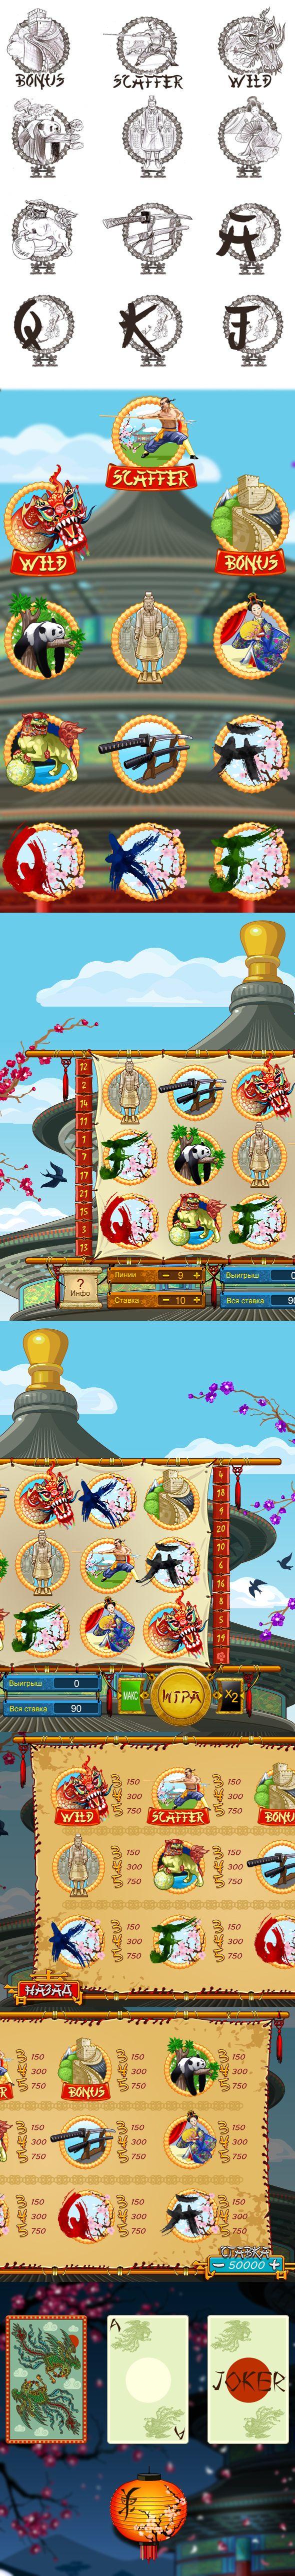 slot online maya symbole